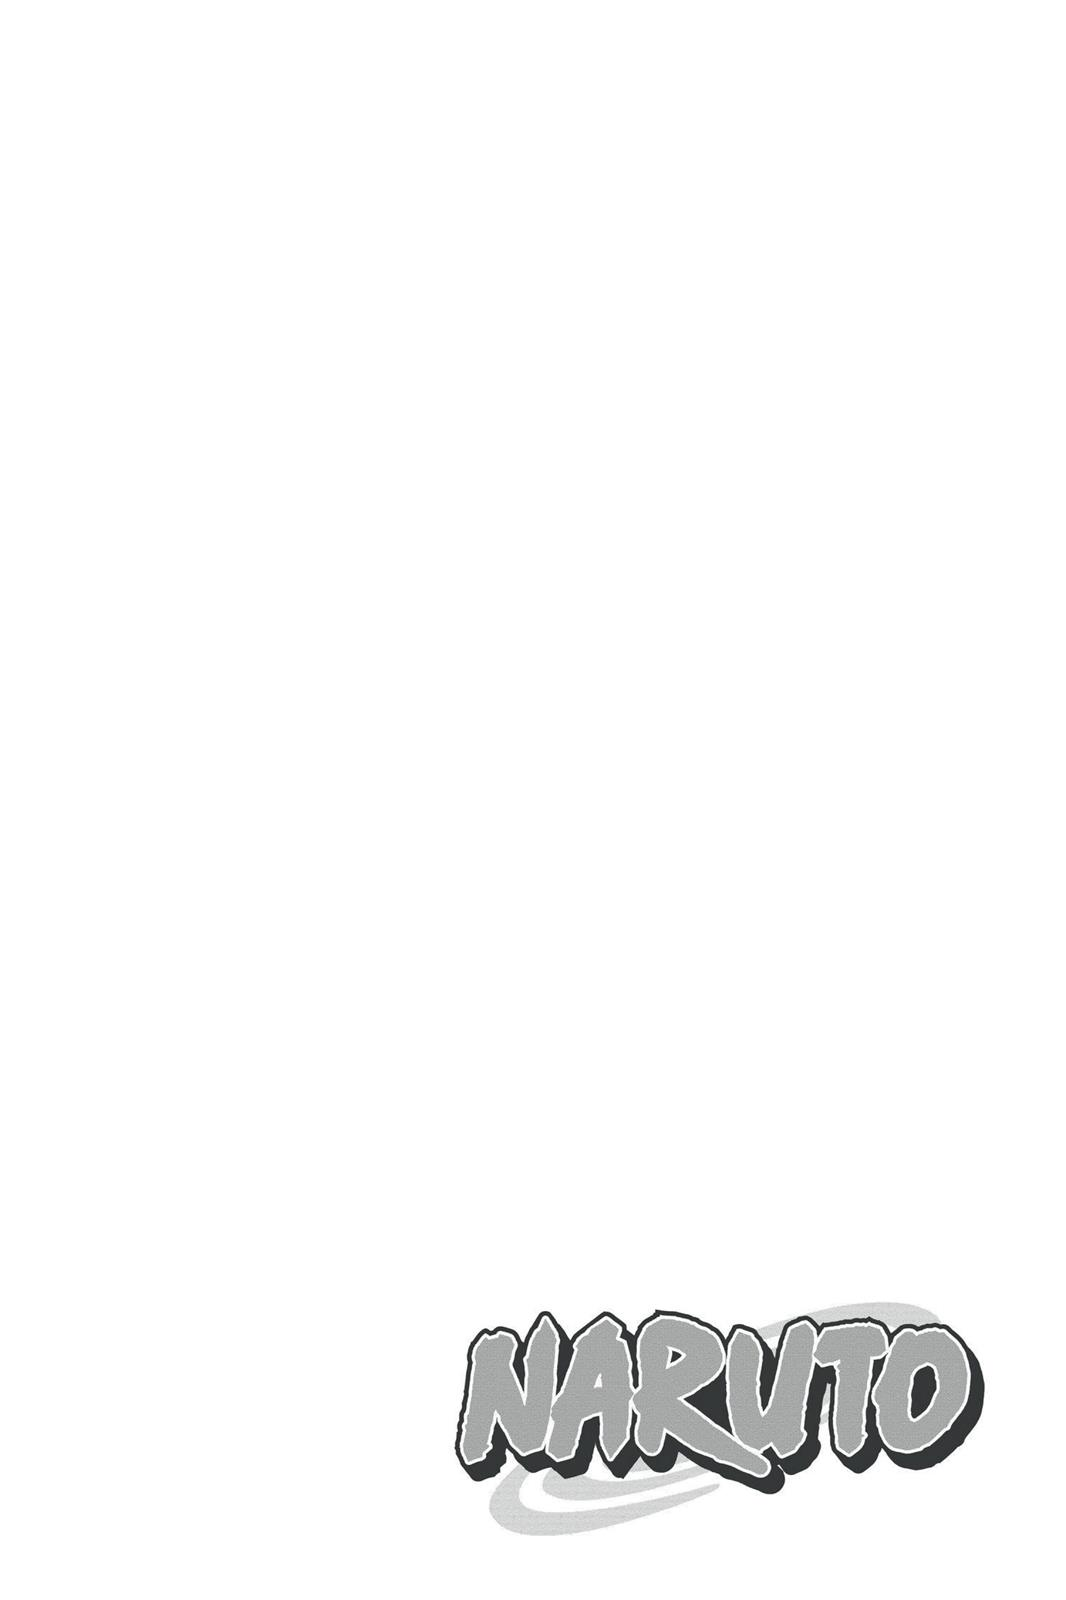 Naruto, Chapter 344 image 017